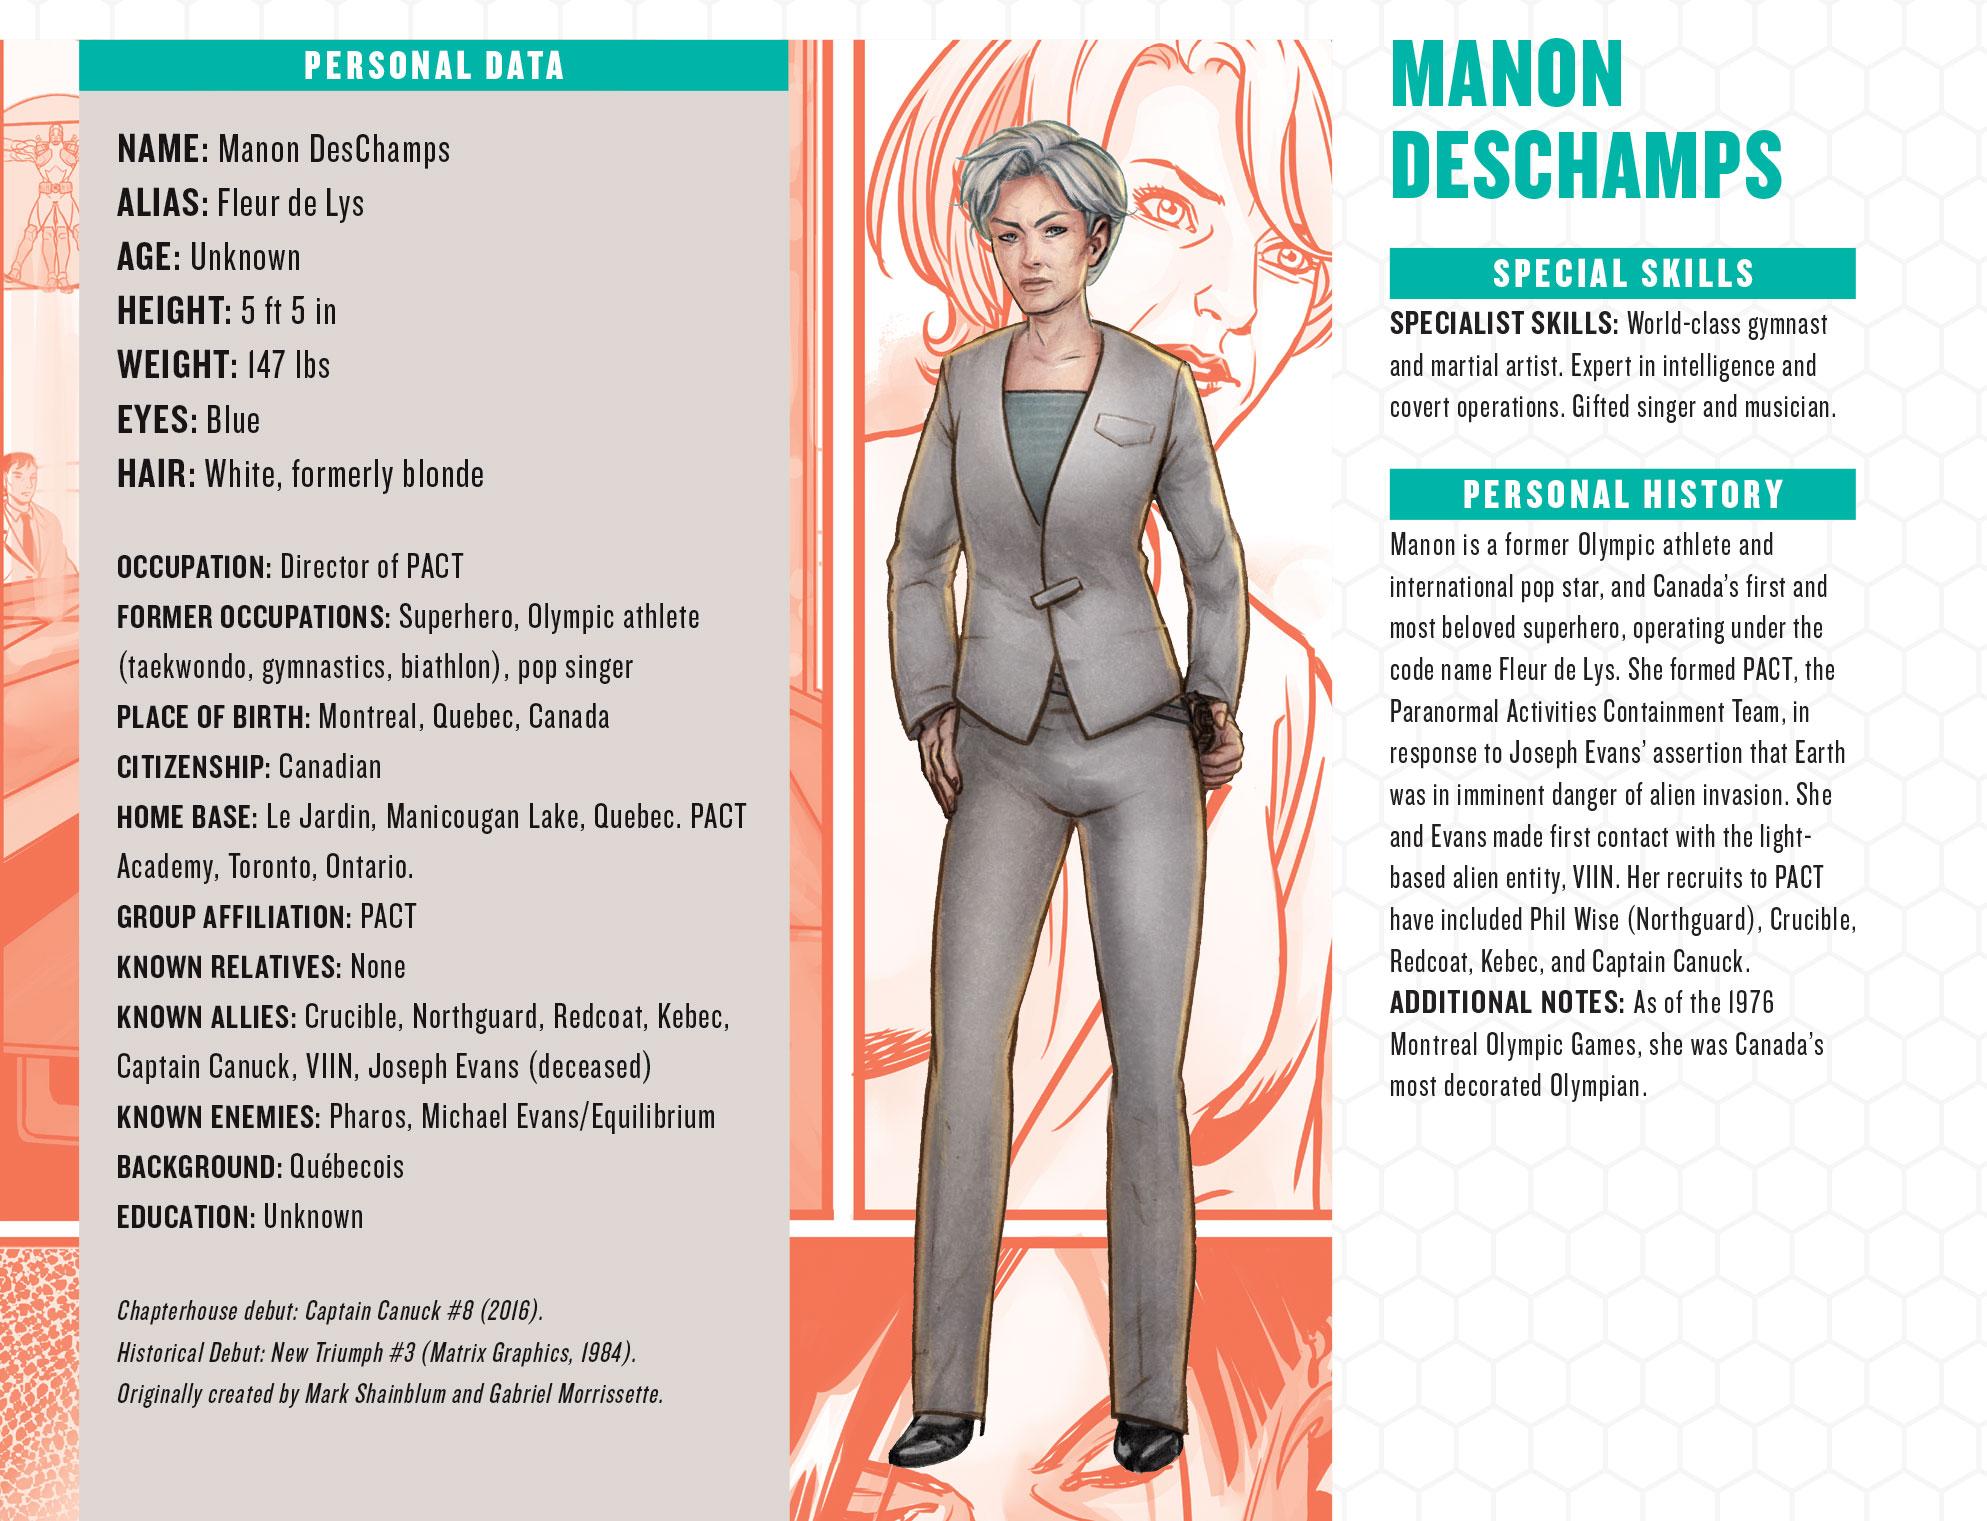 Chapterverse_character-bios_2018-ManonD.jpg